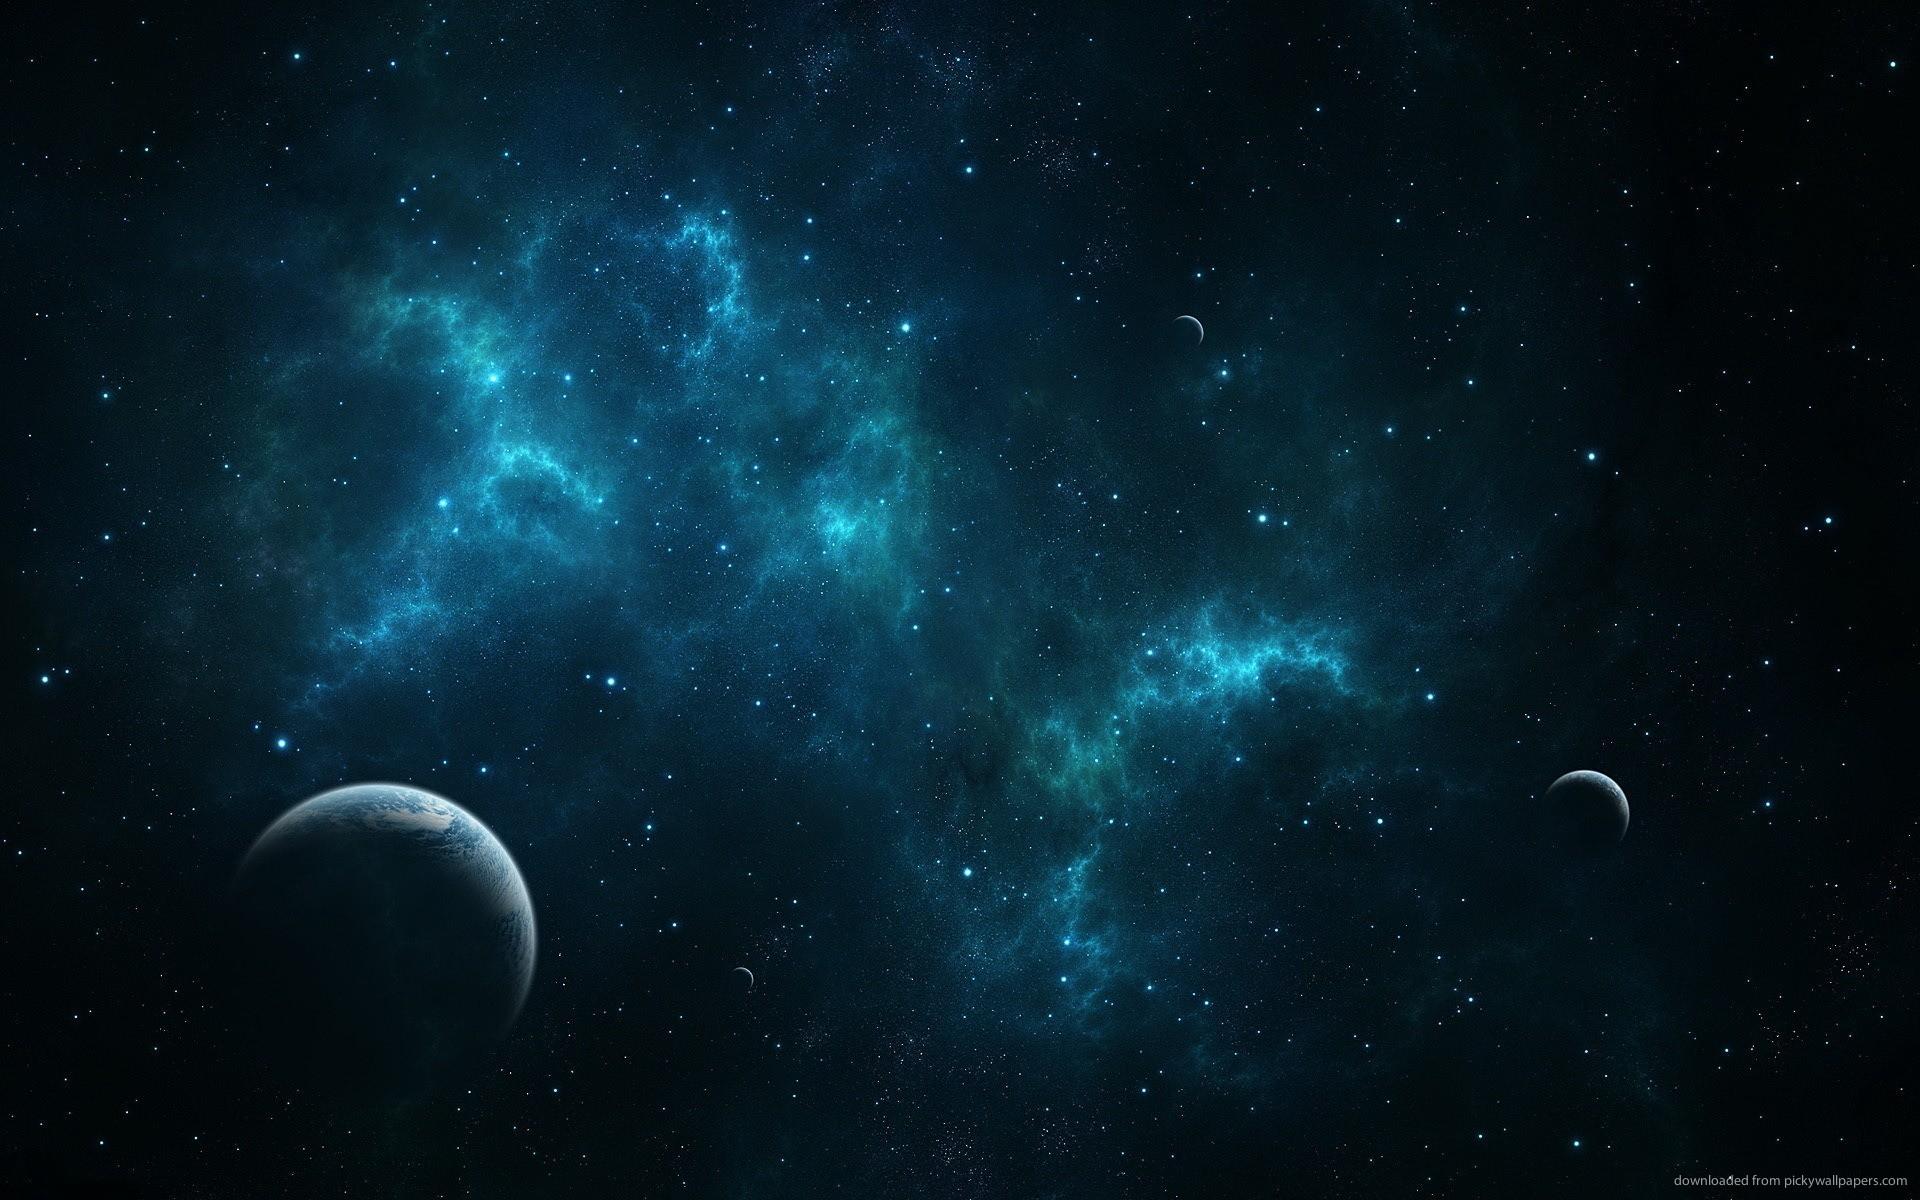 Download 1920x1200 Deep Blue Space Wallpaper 1920x1200